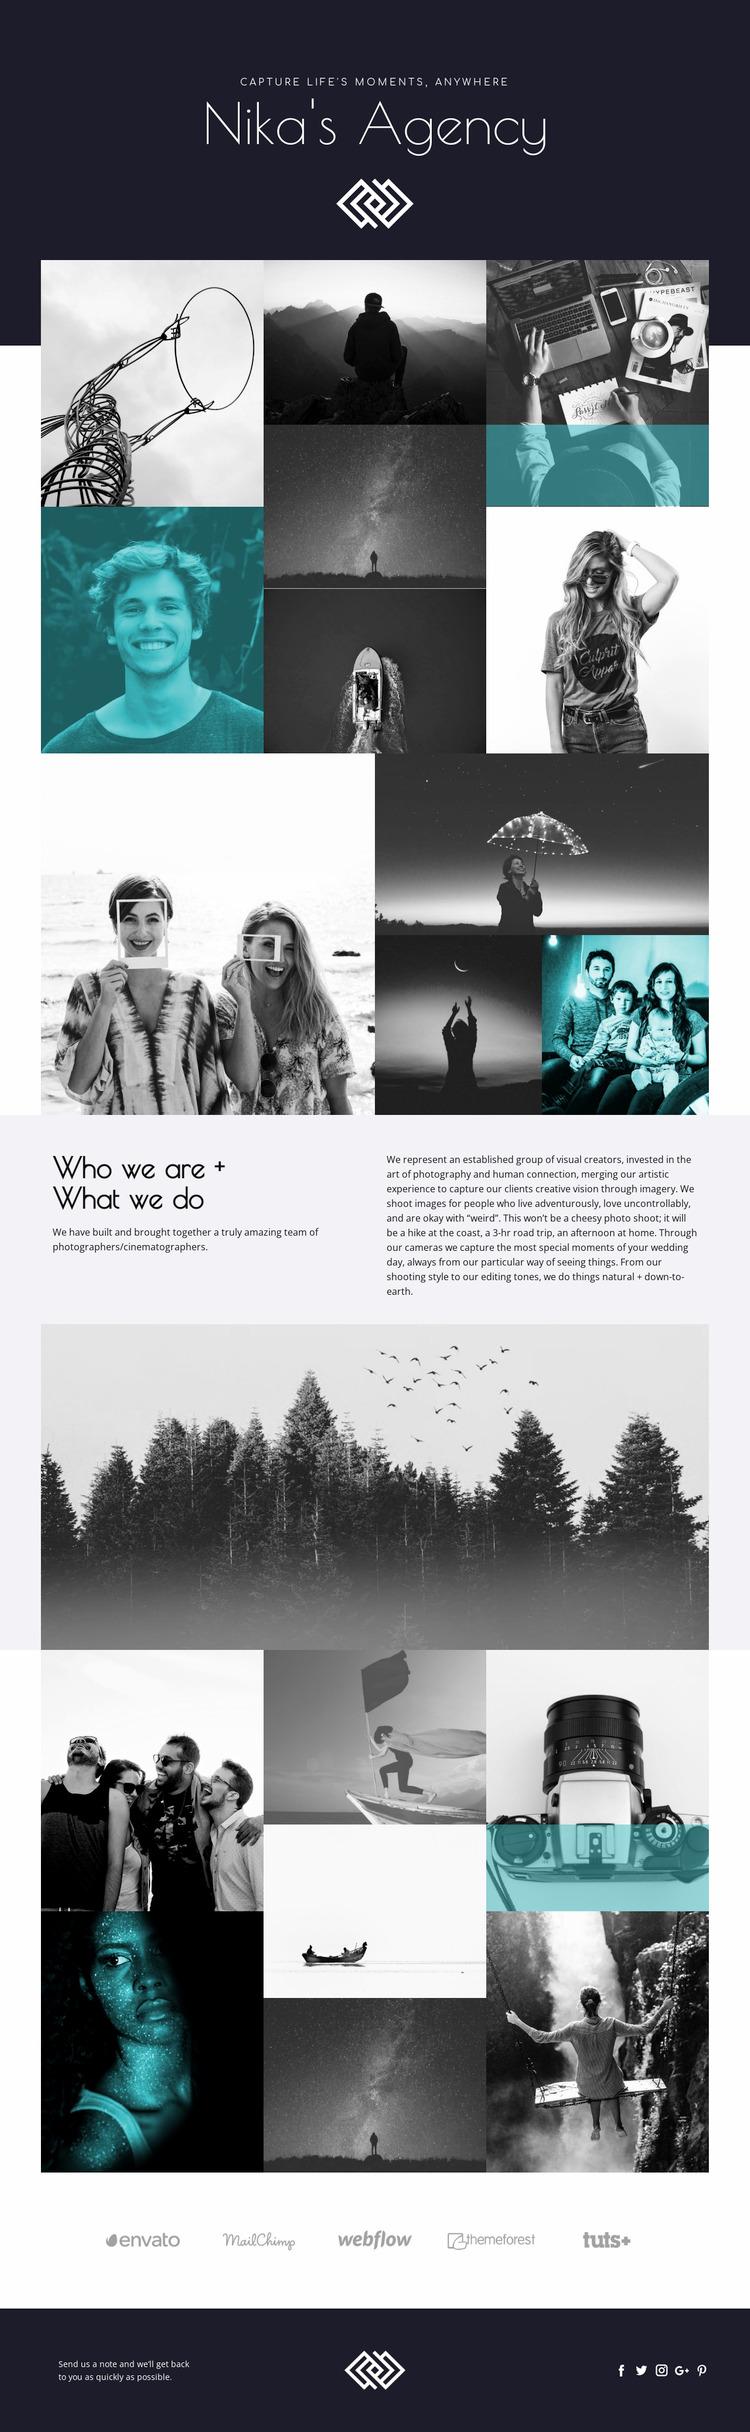 Nika's Agency WordPress Website Builder